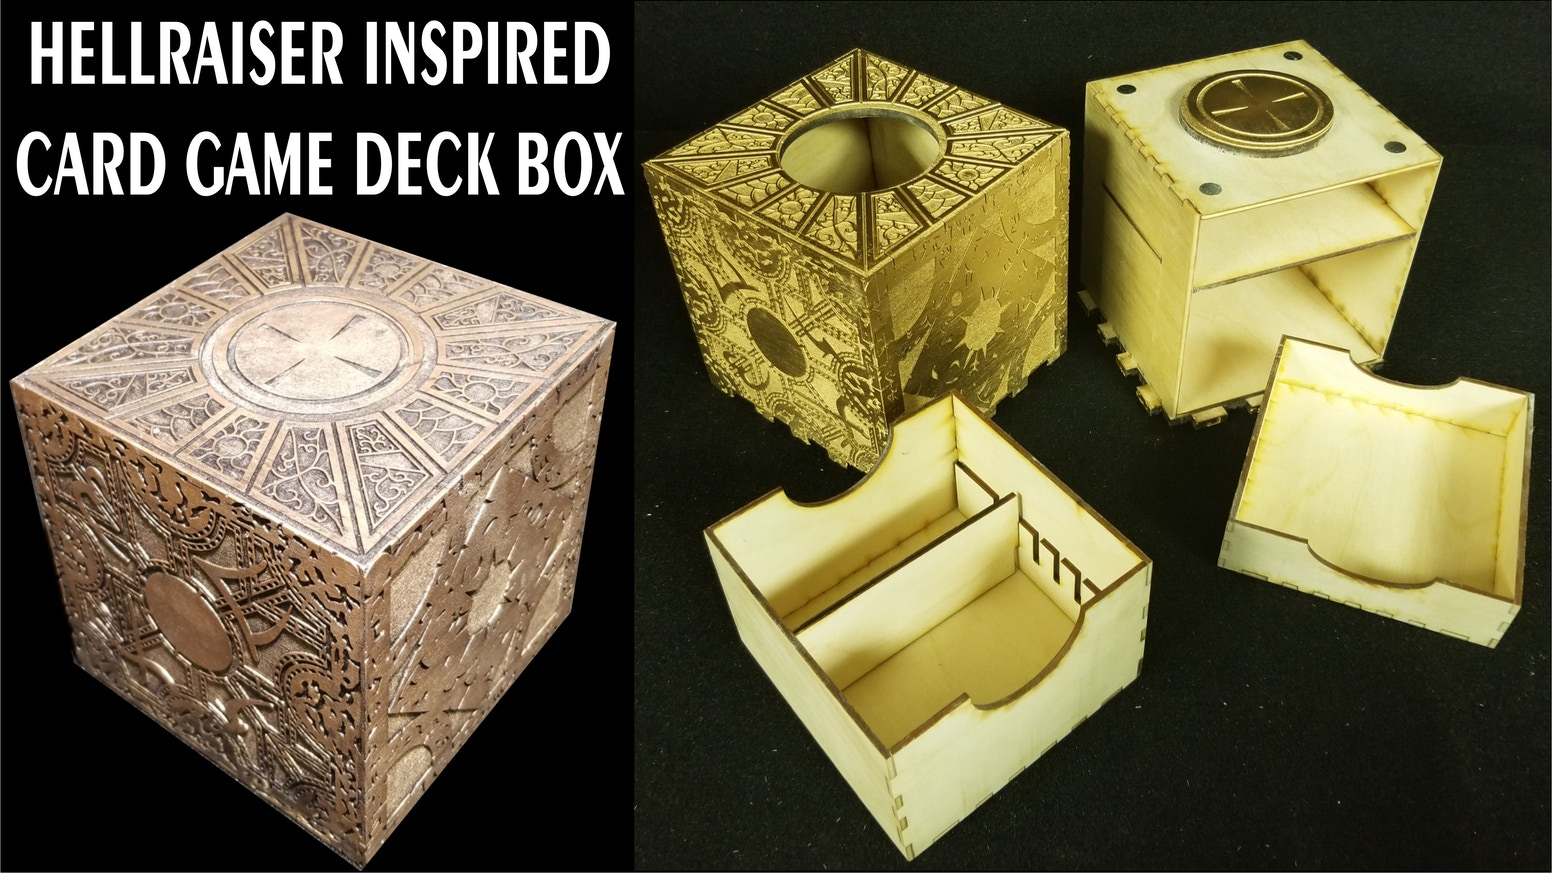 Hellraiser Inspired Boxes / Deck Boxes / Functional Puzzle Boxes / Decorative Boxes / MTG Commander Boxes / Storage Boxes / Wood Boxes